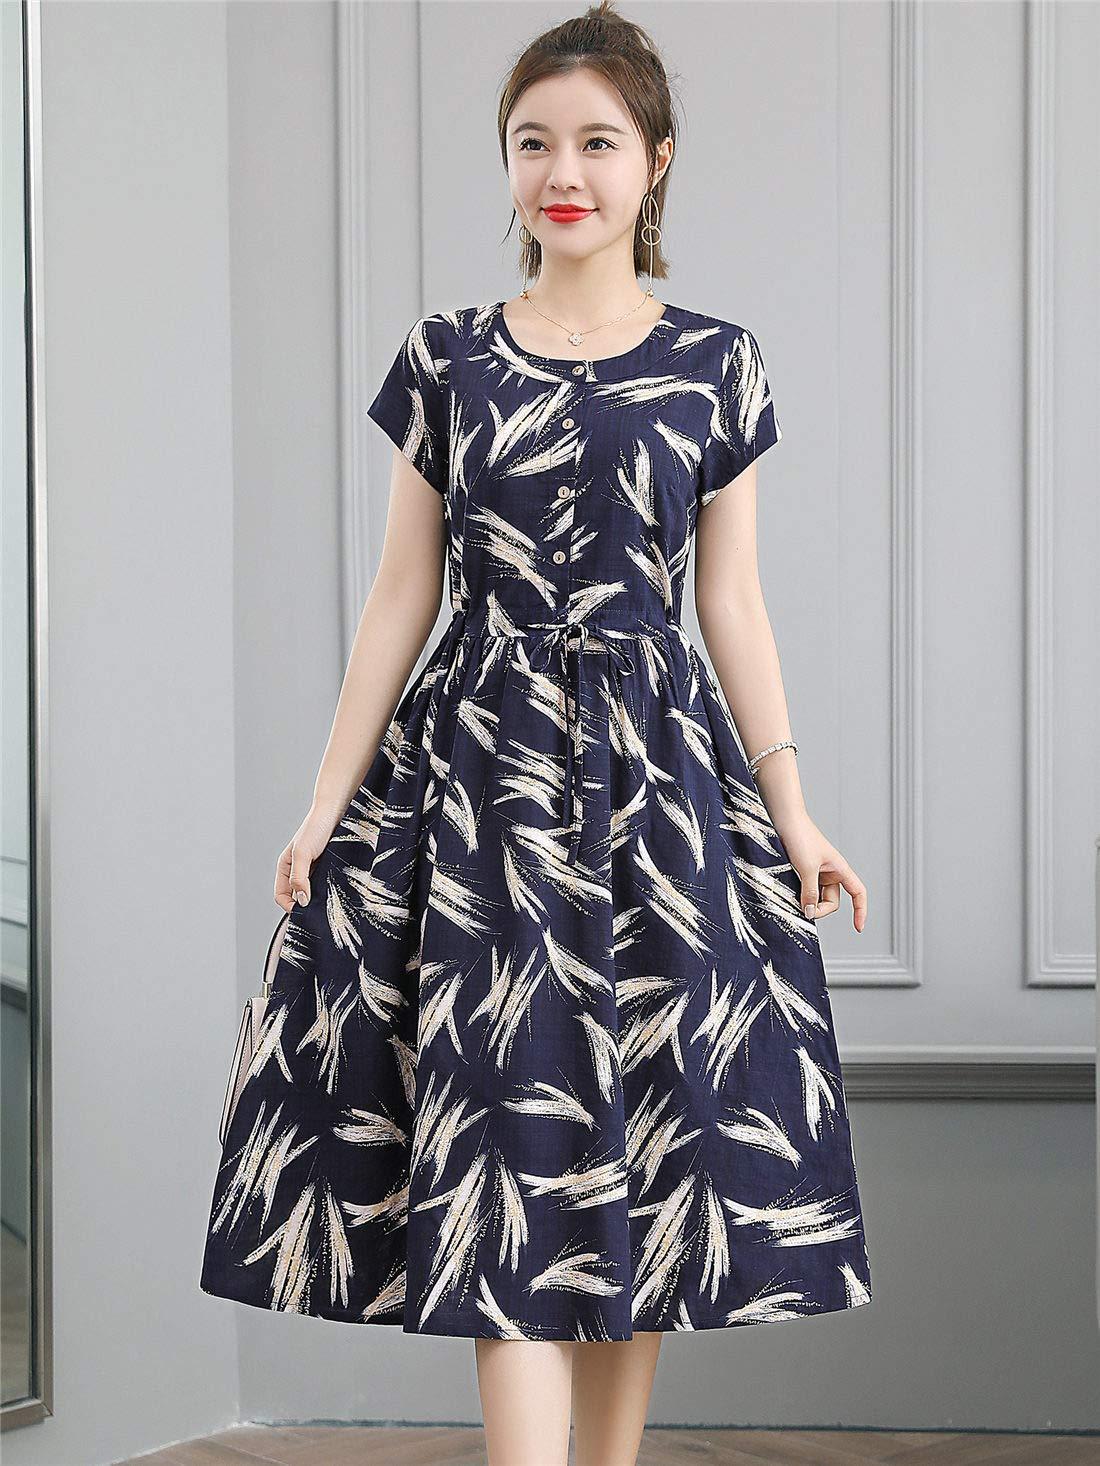 Fanru 梵如 女式夏装新款韩版印花棉麻连衣裙女短袖气质学院风裙子 7B18-ZH1X